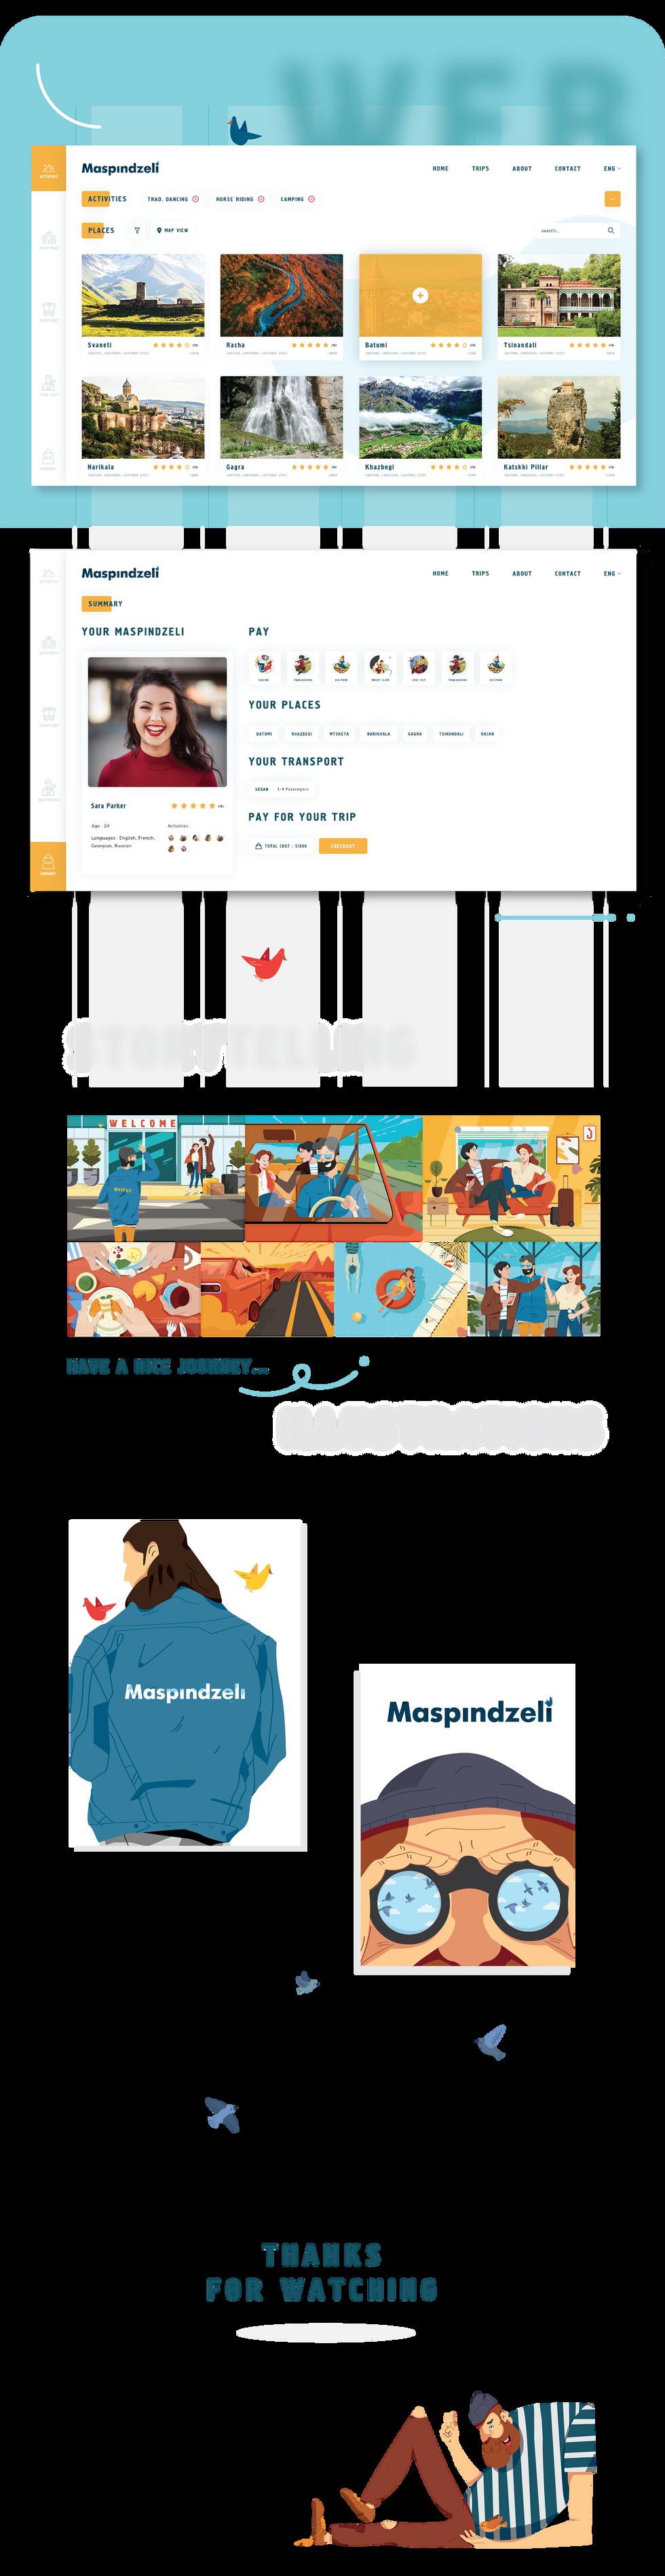 Maspindzeli illustrations